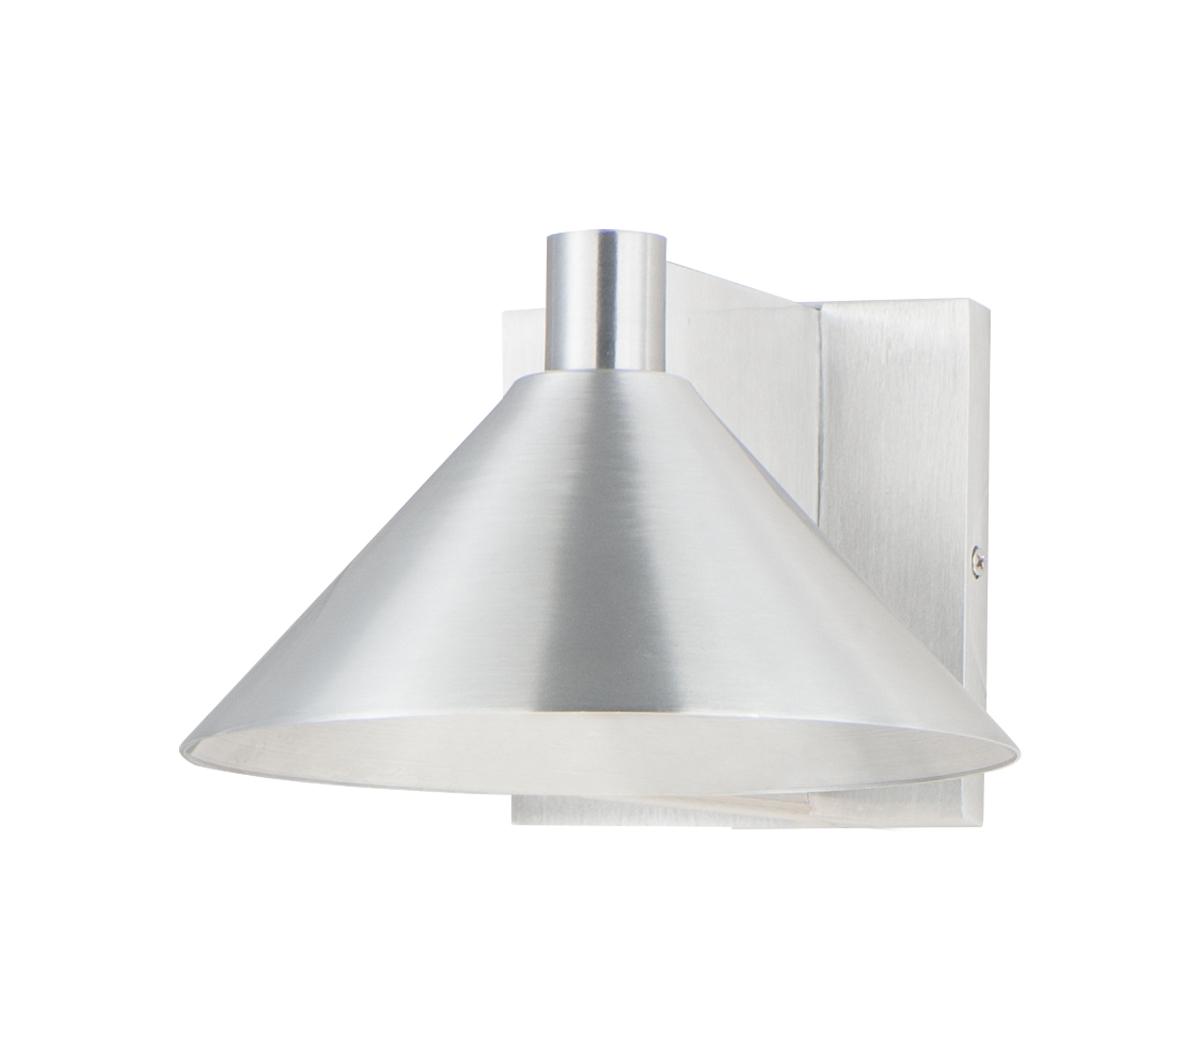 Conoid Medium LED Outdoor Wall Sconce | Maxim Lighting